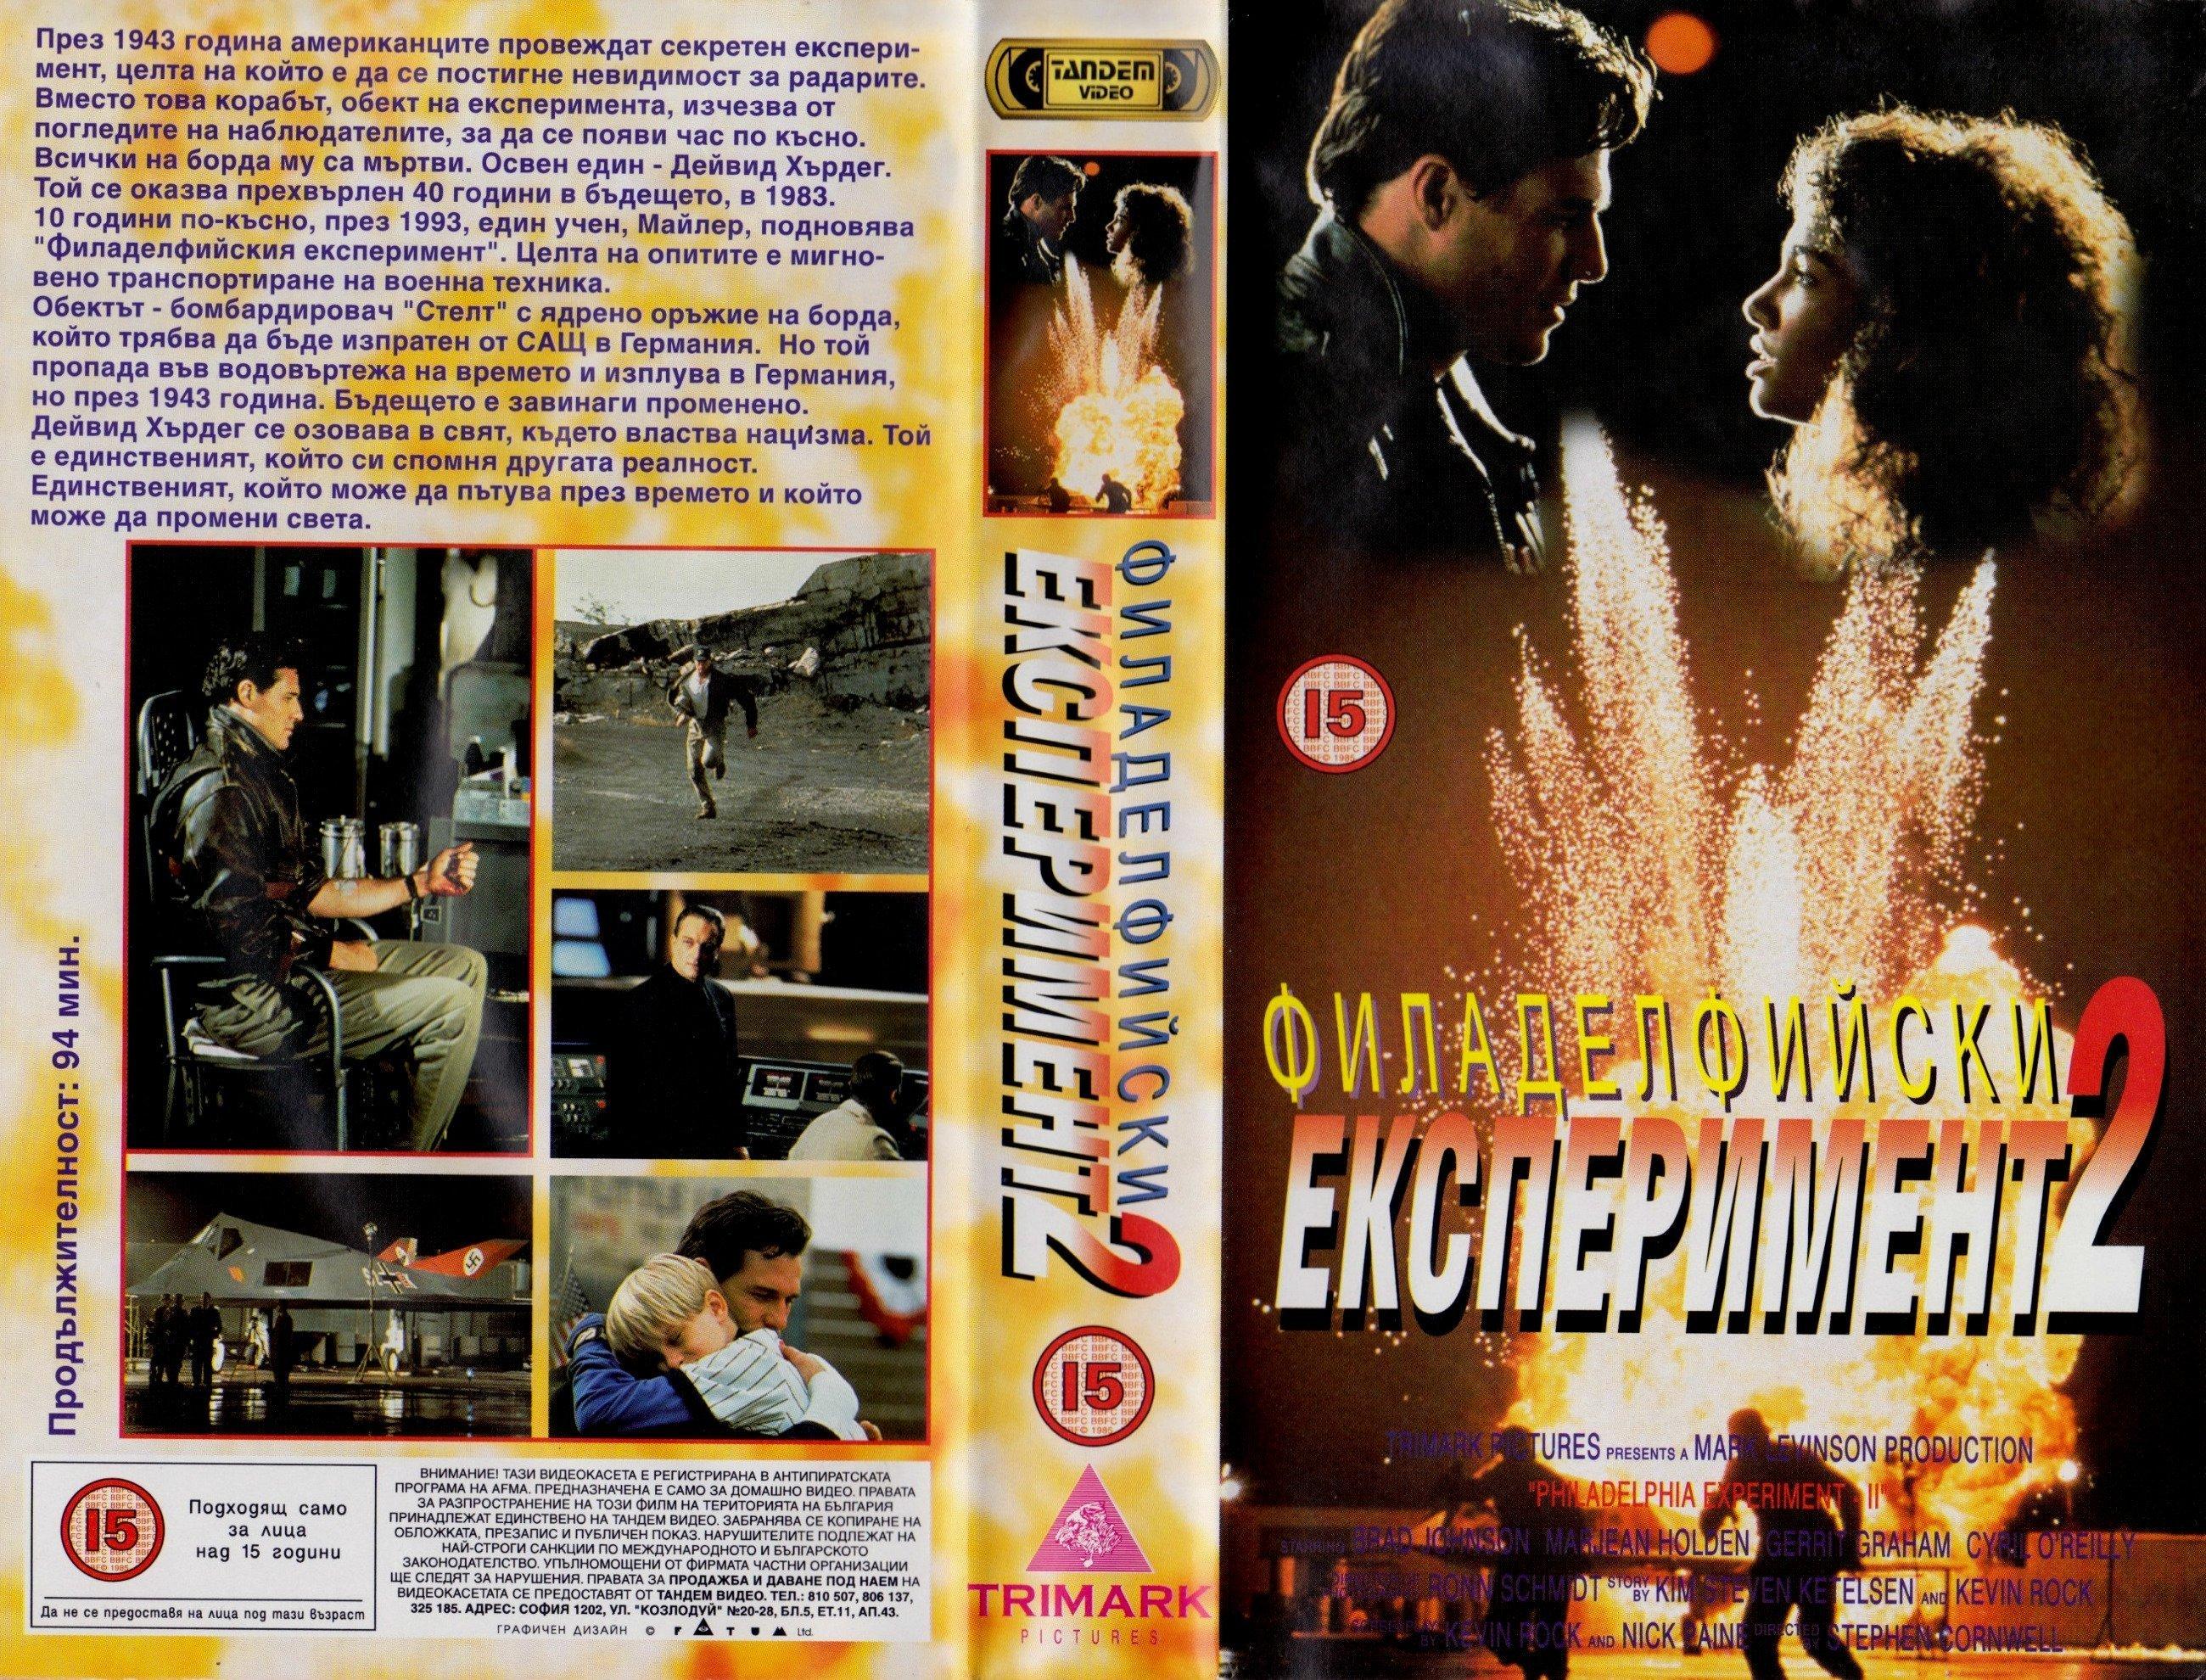 Филаделфийски експеримент филм